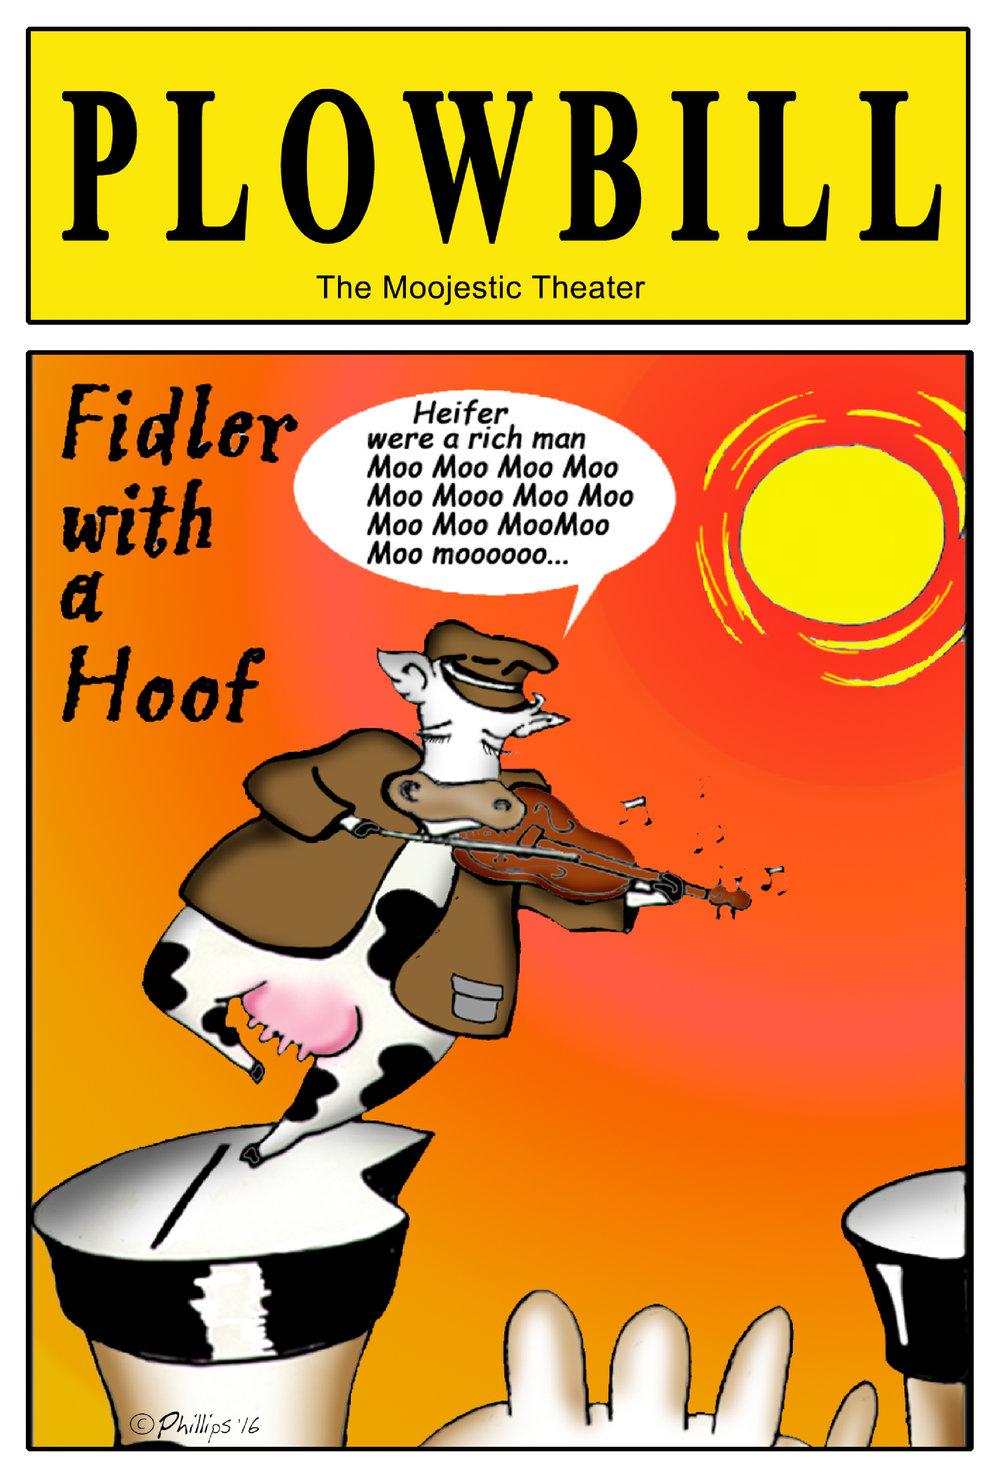 Plowbill Fiddler#7 Tee.jpg